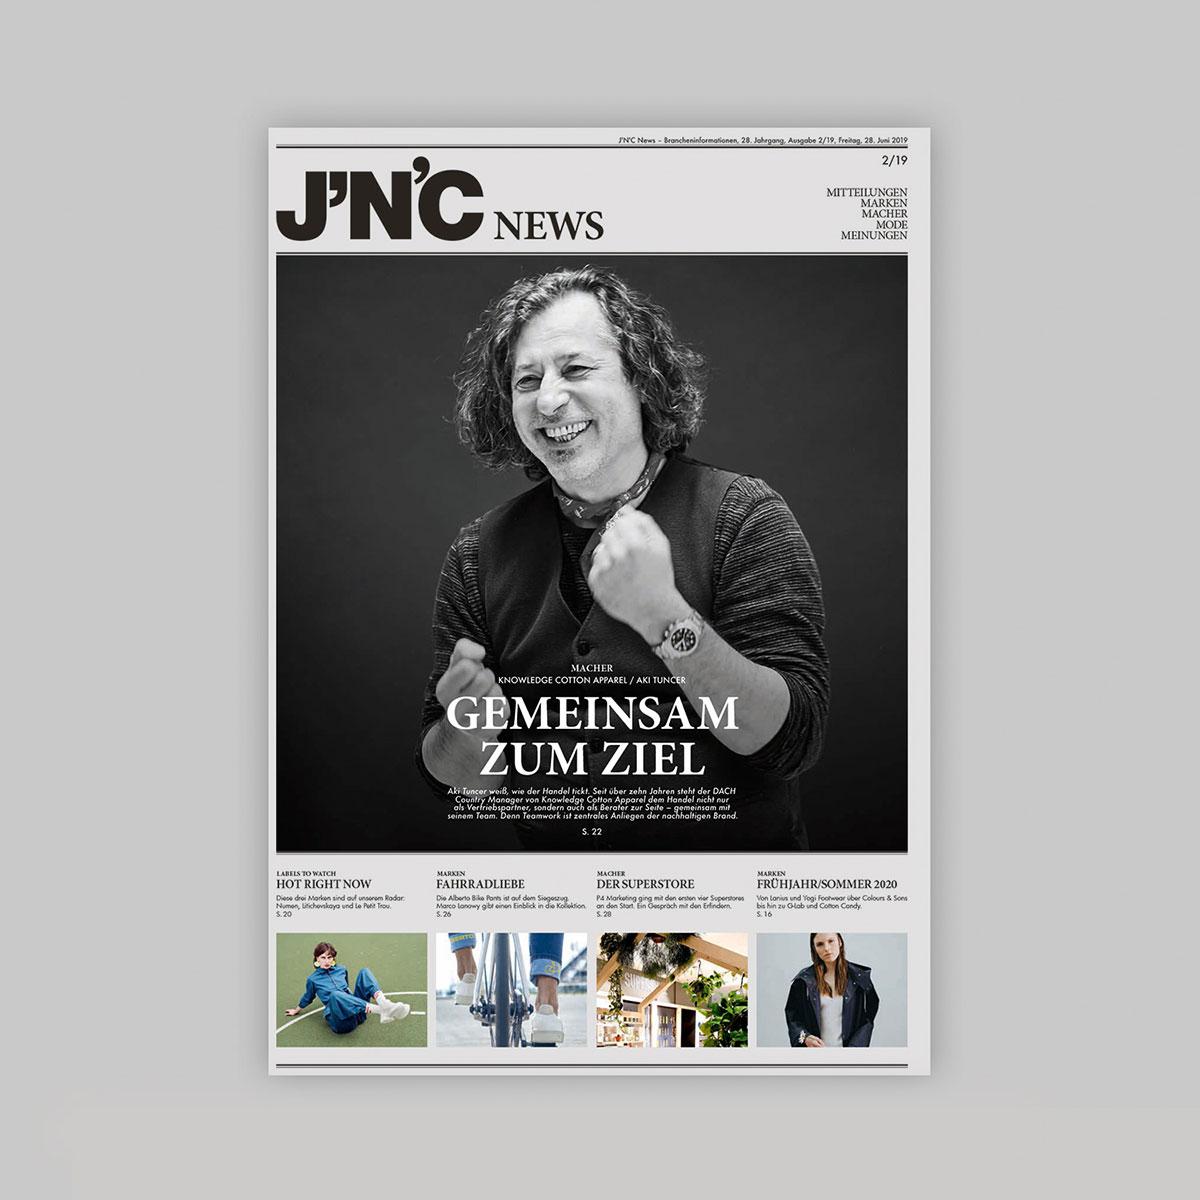 P4 bei J'N'C NEWS